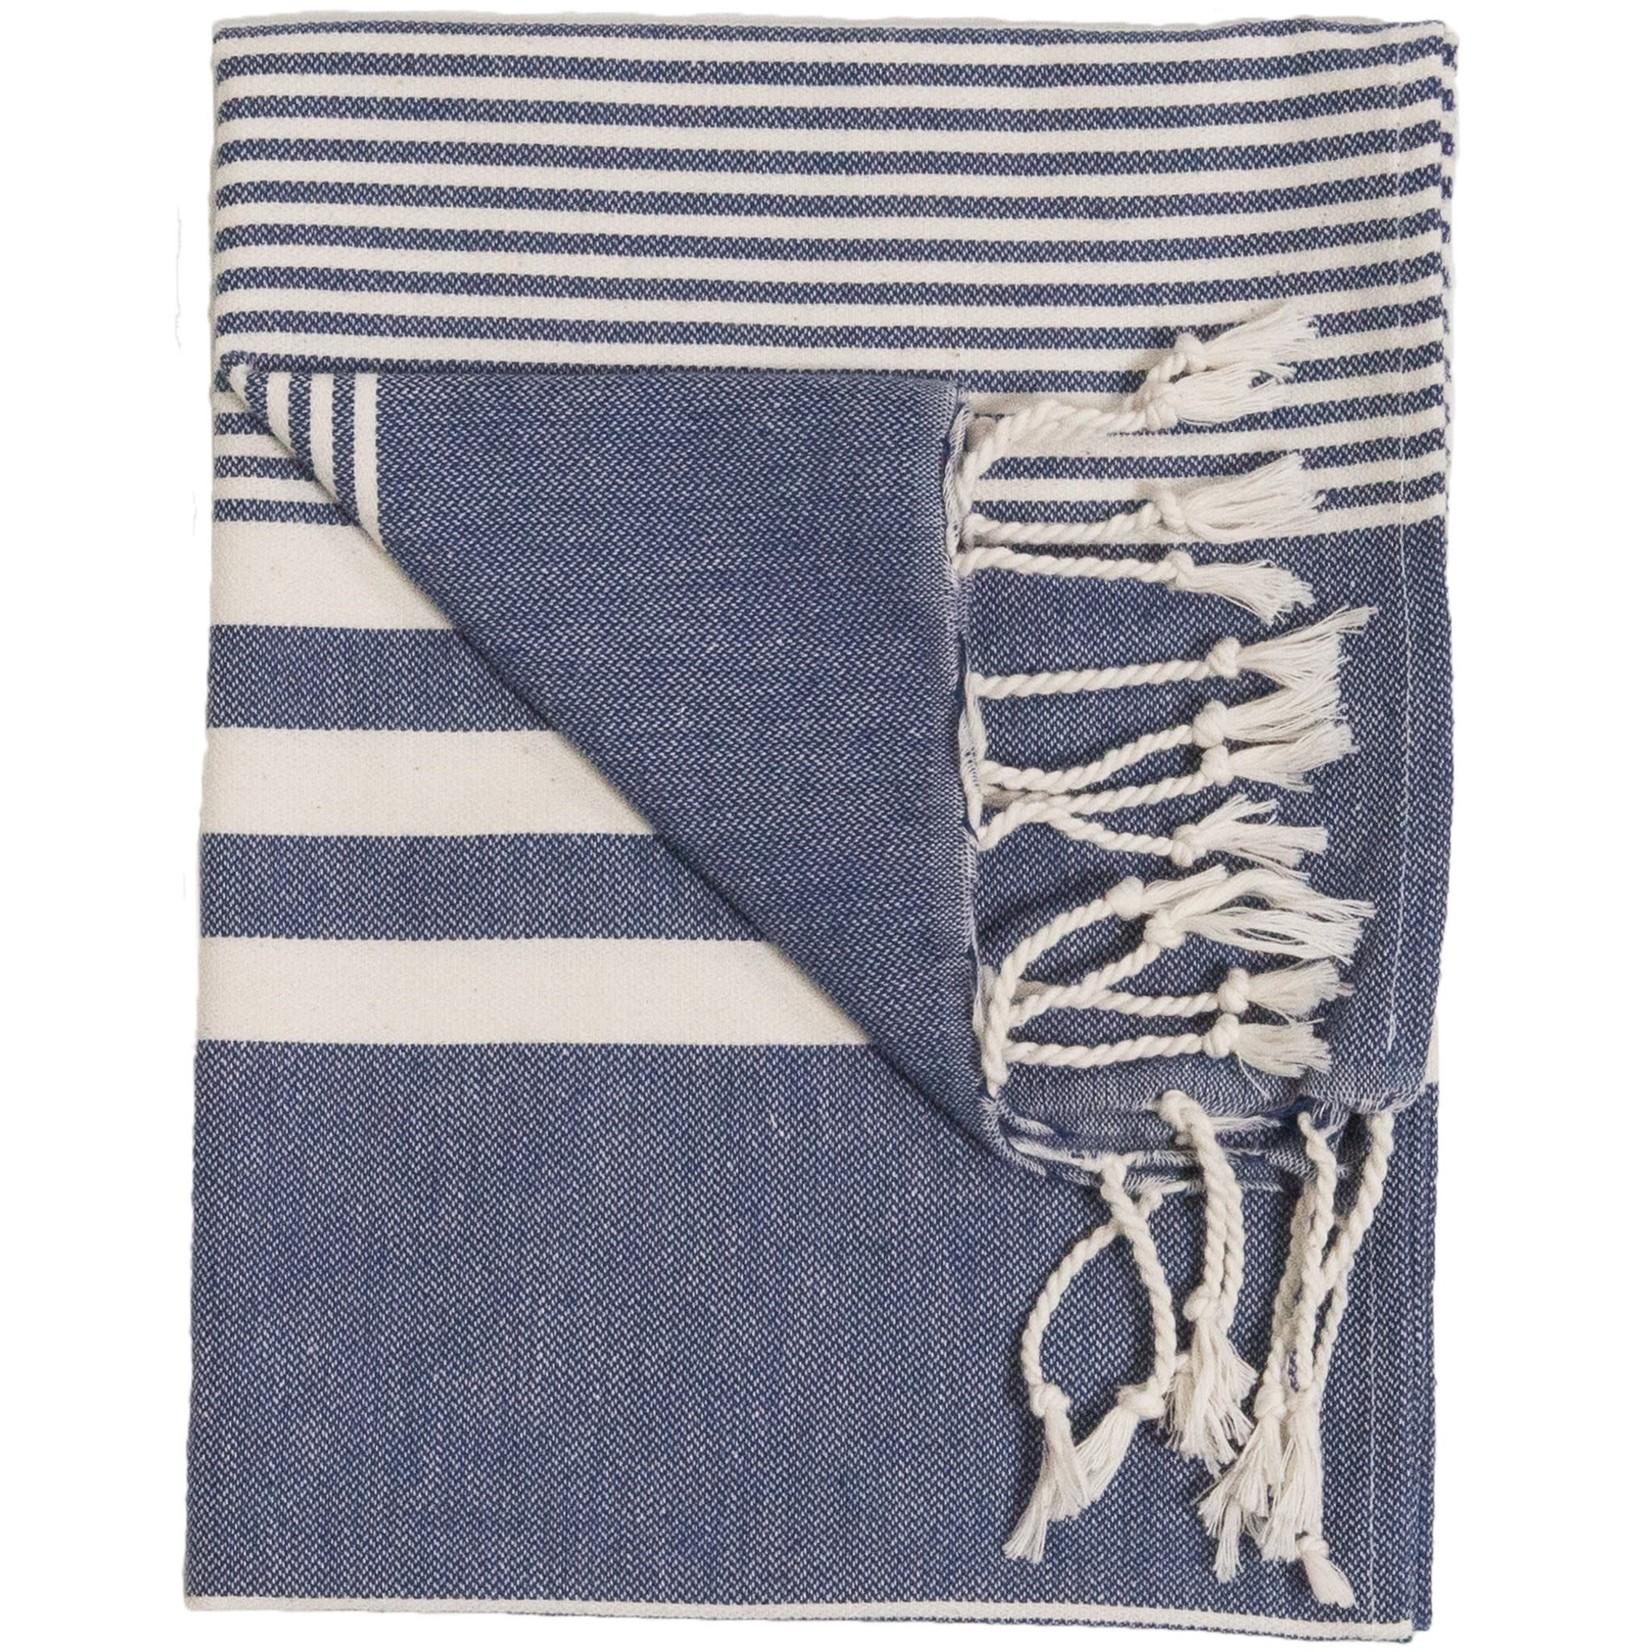 Pokoloko Harem Towel